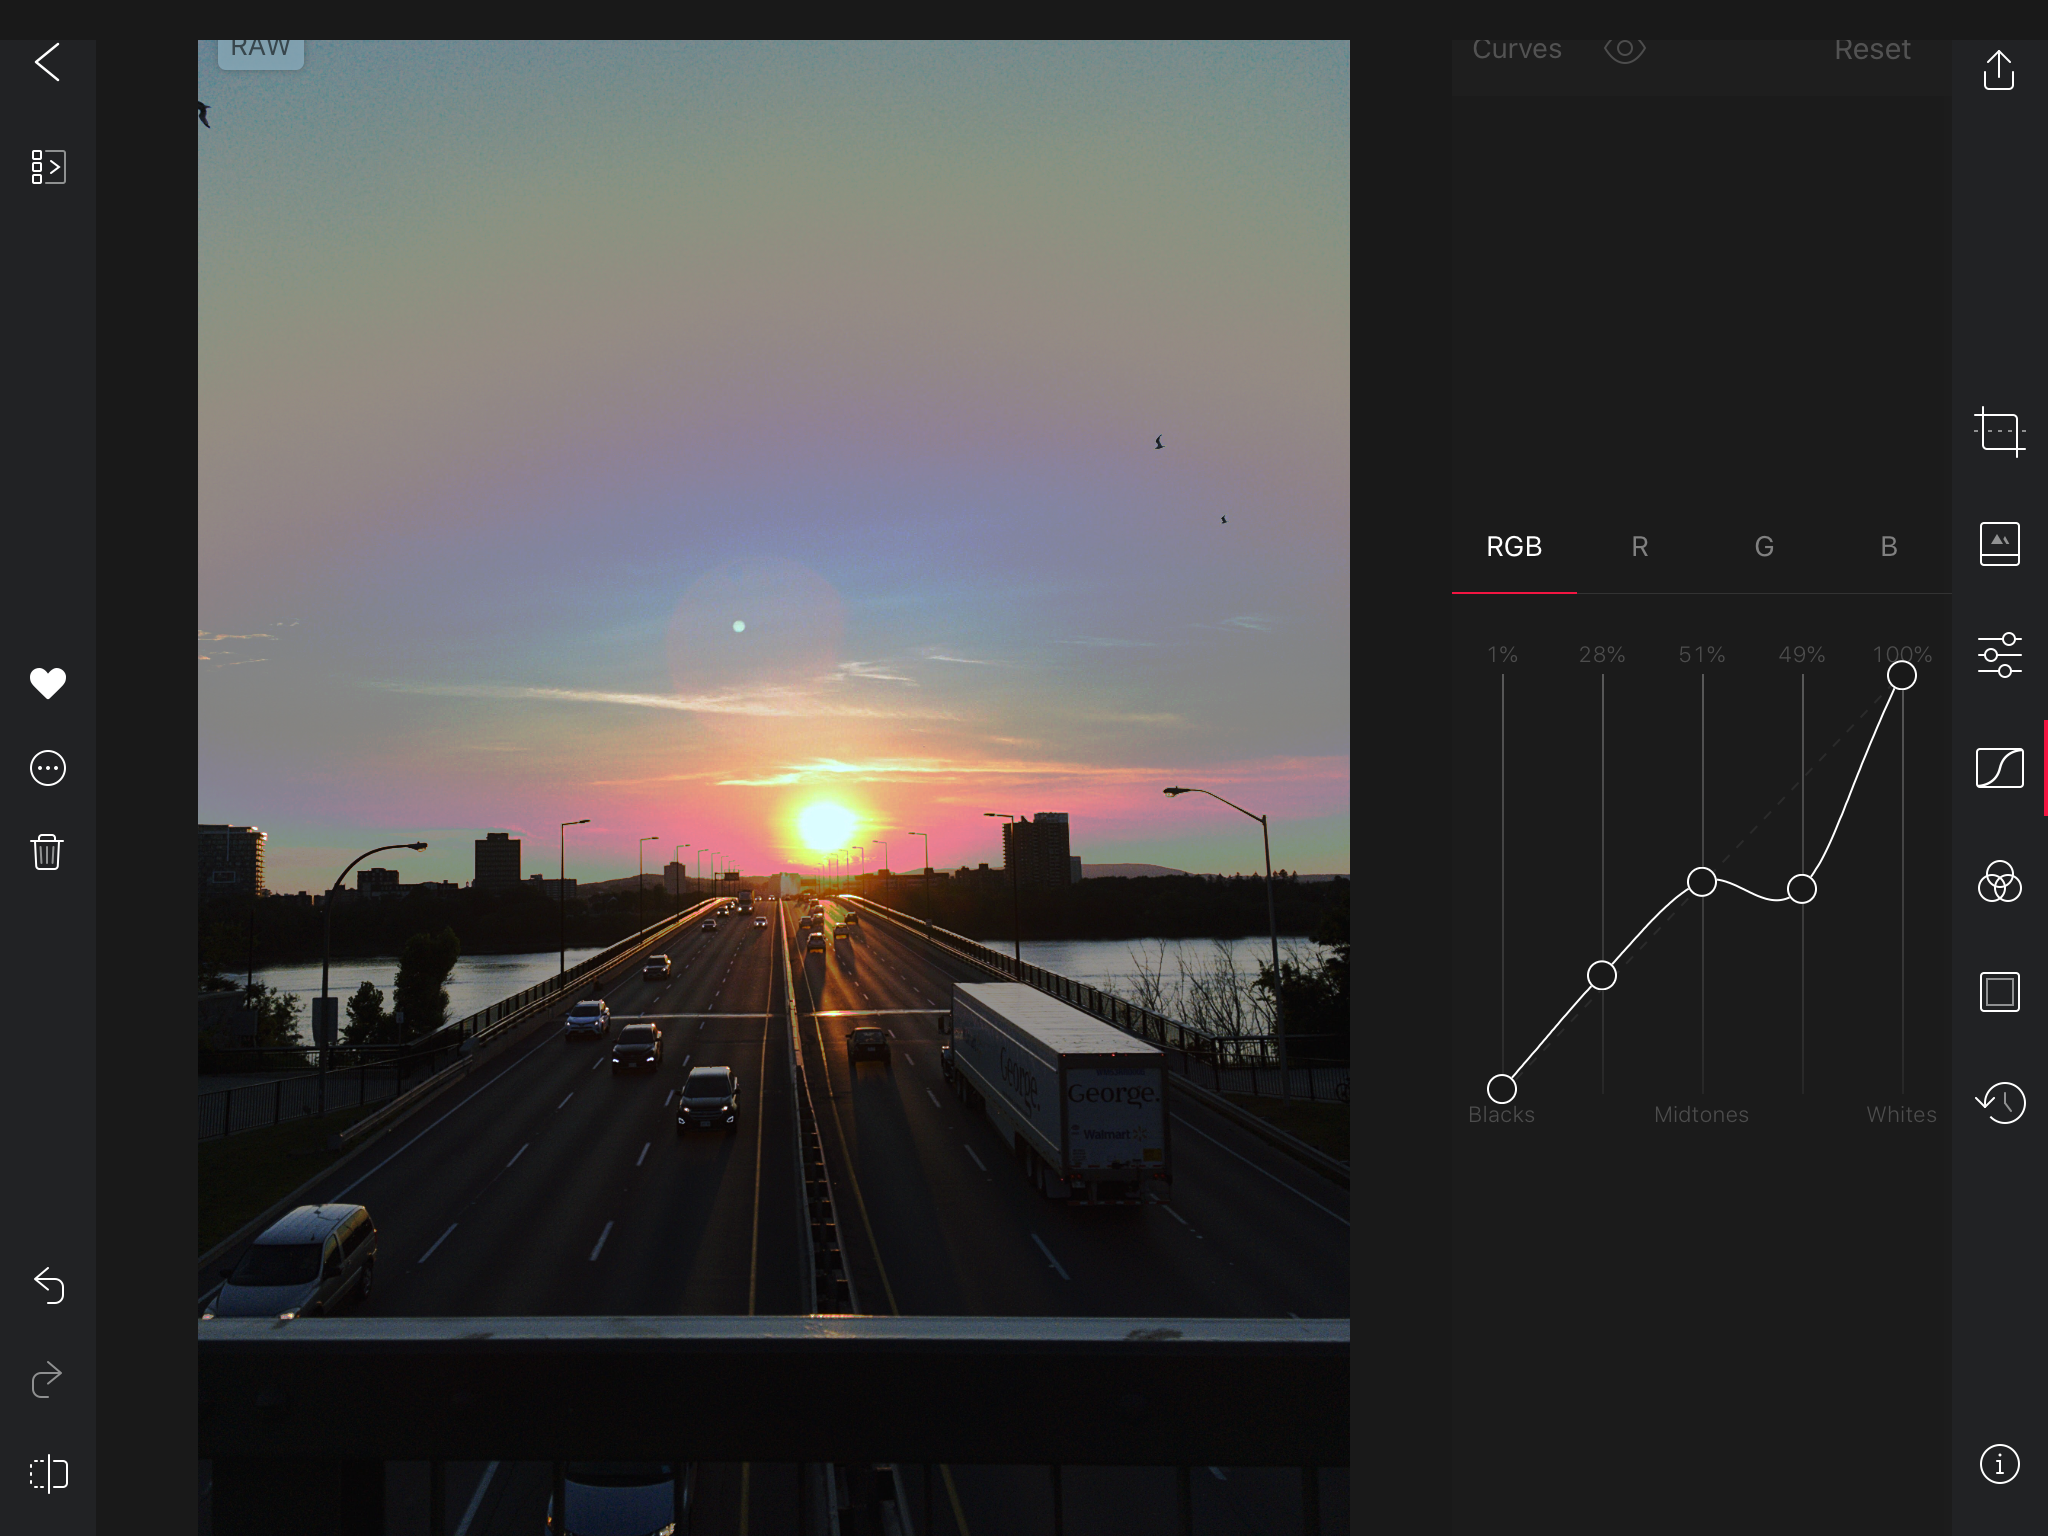 best ipad photo editing app 2019